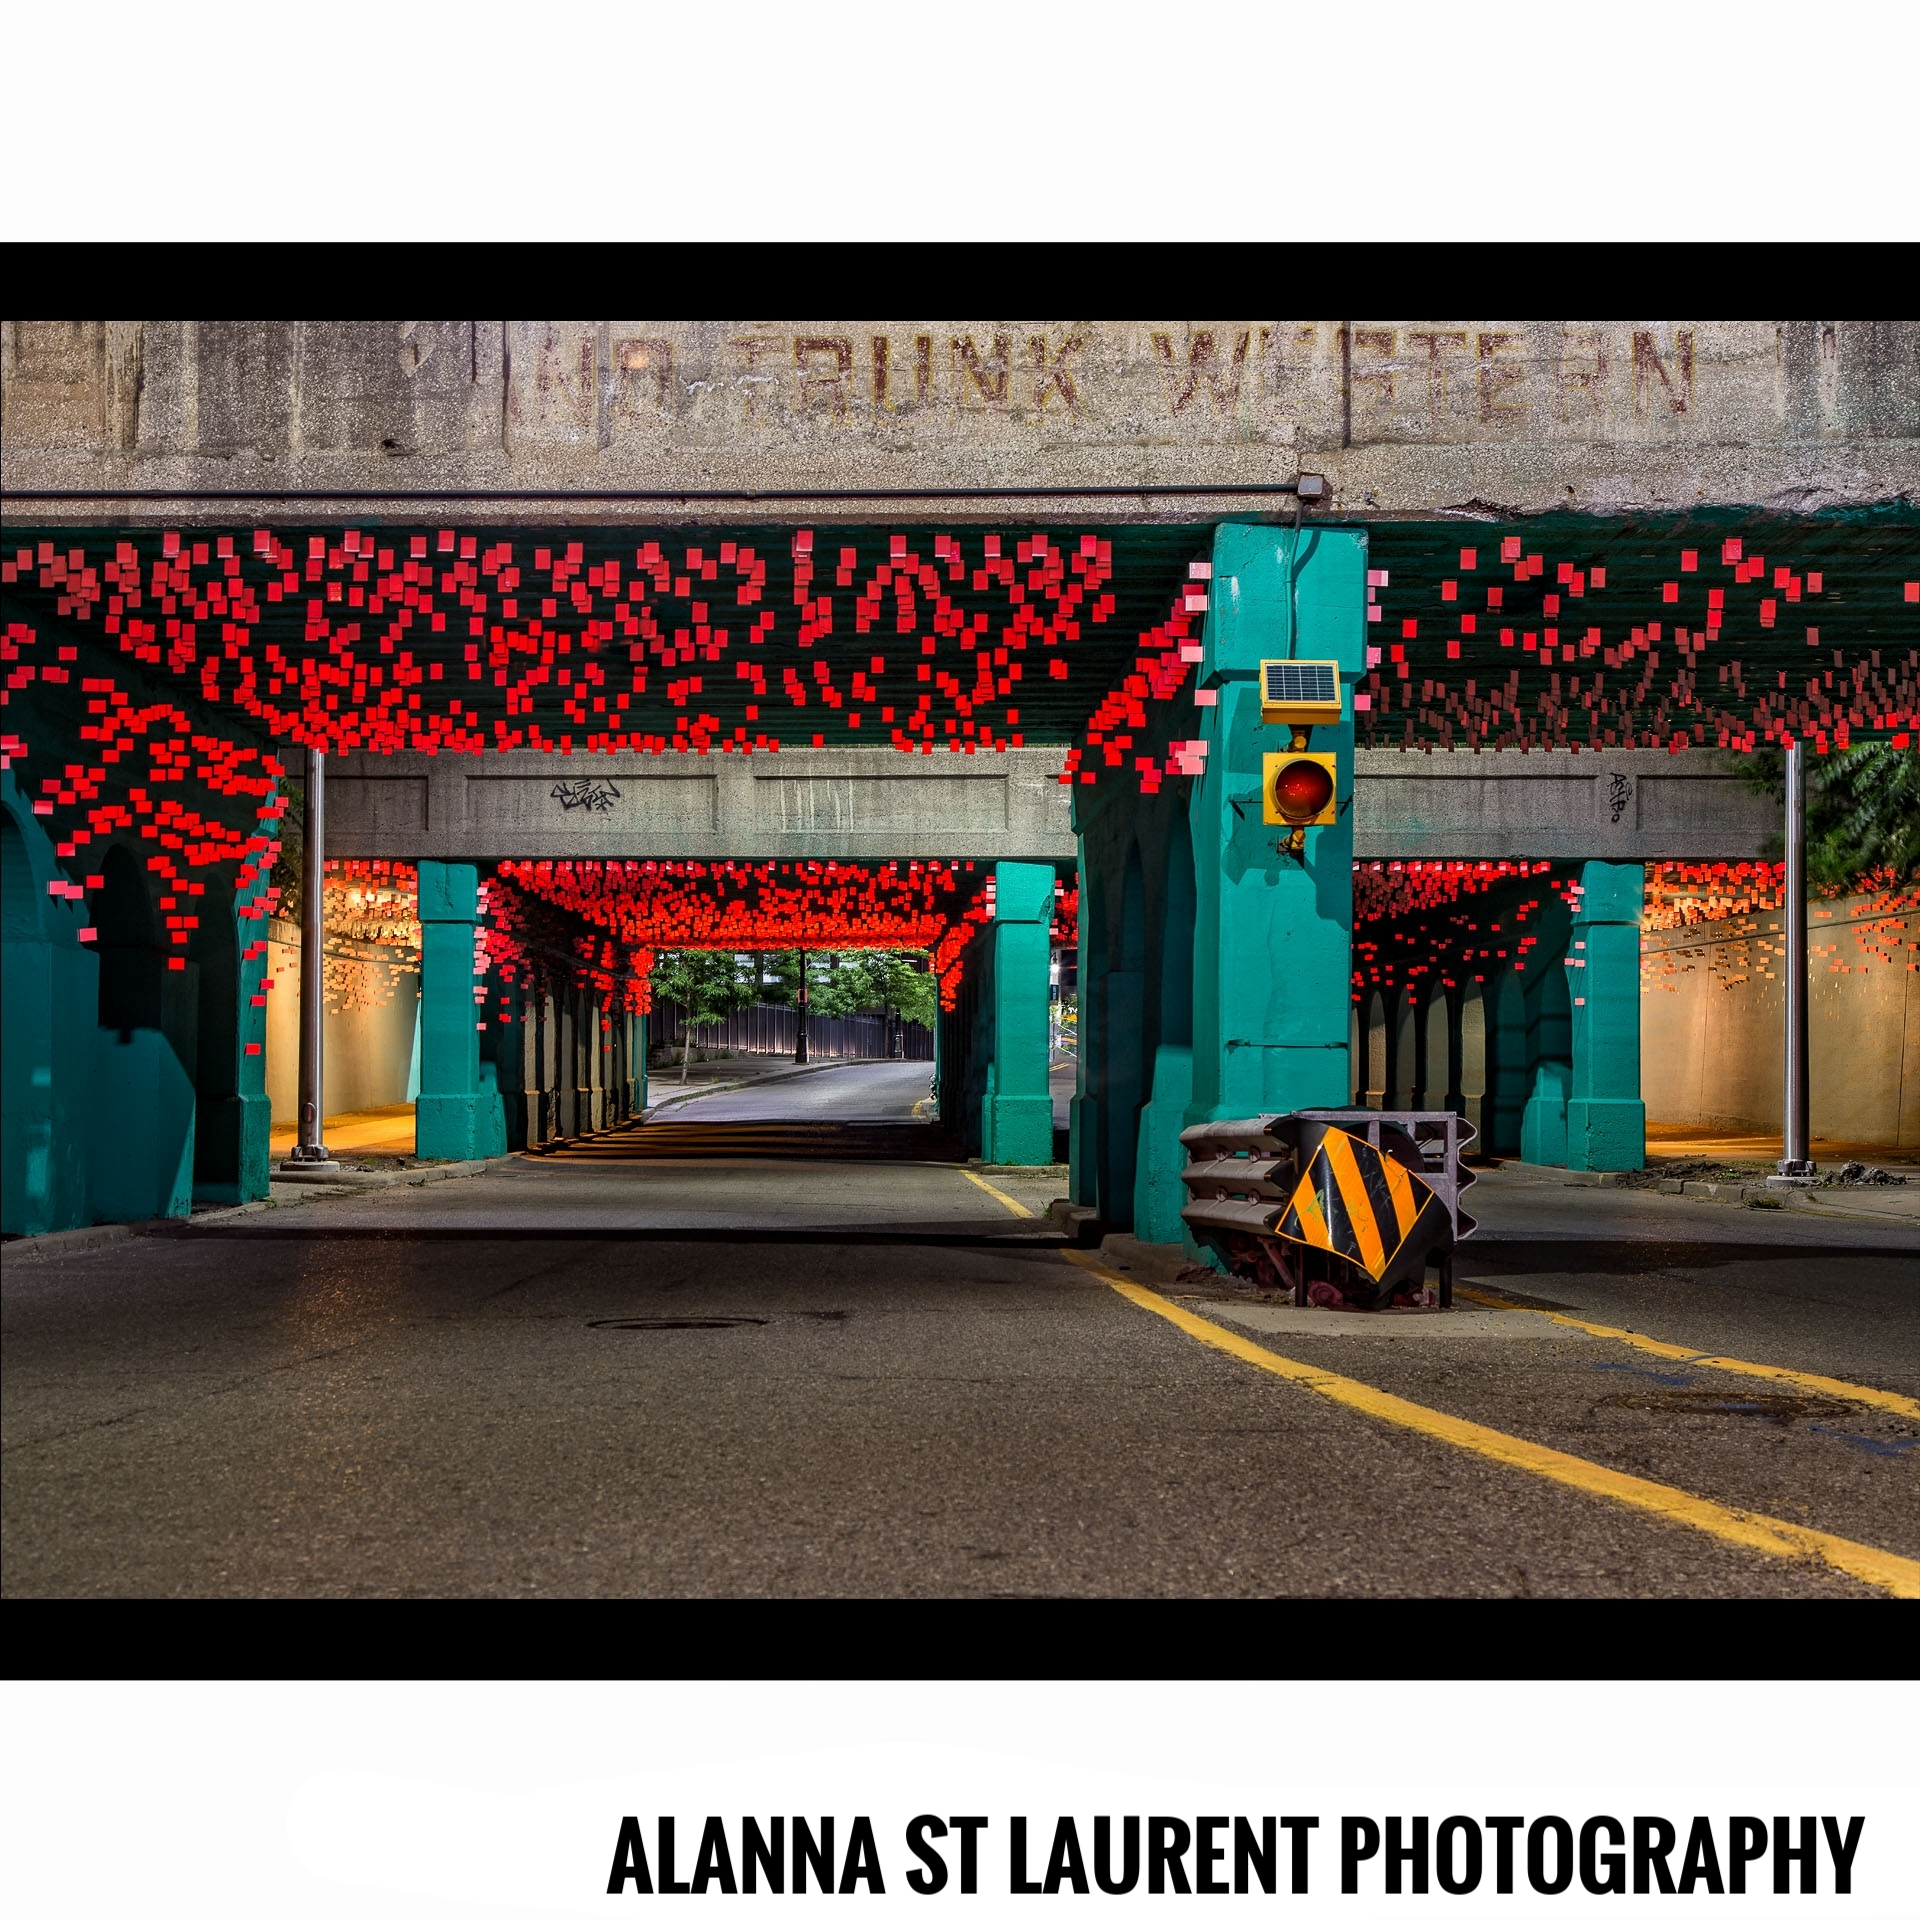 ALANNA ST LAURENT PHOTOGRAPHY